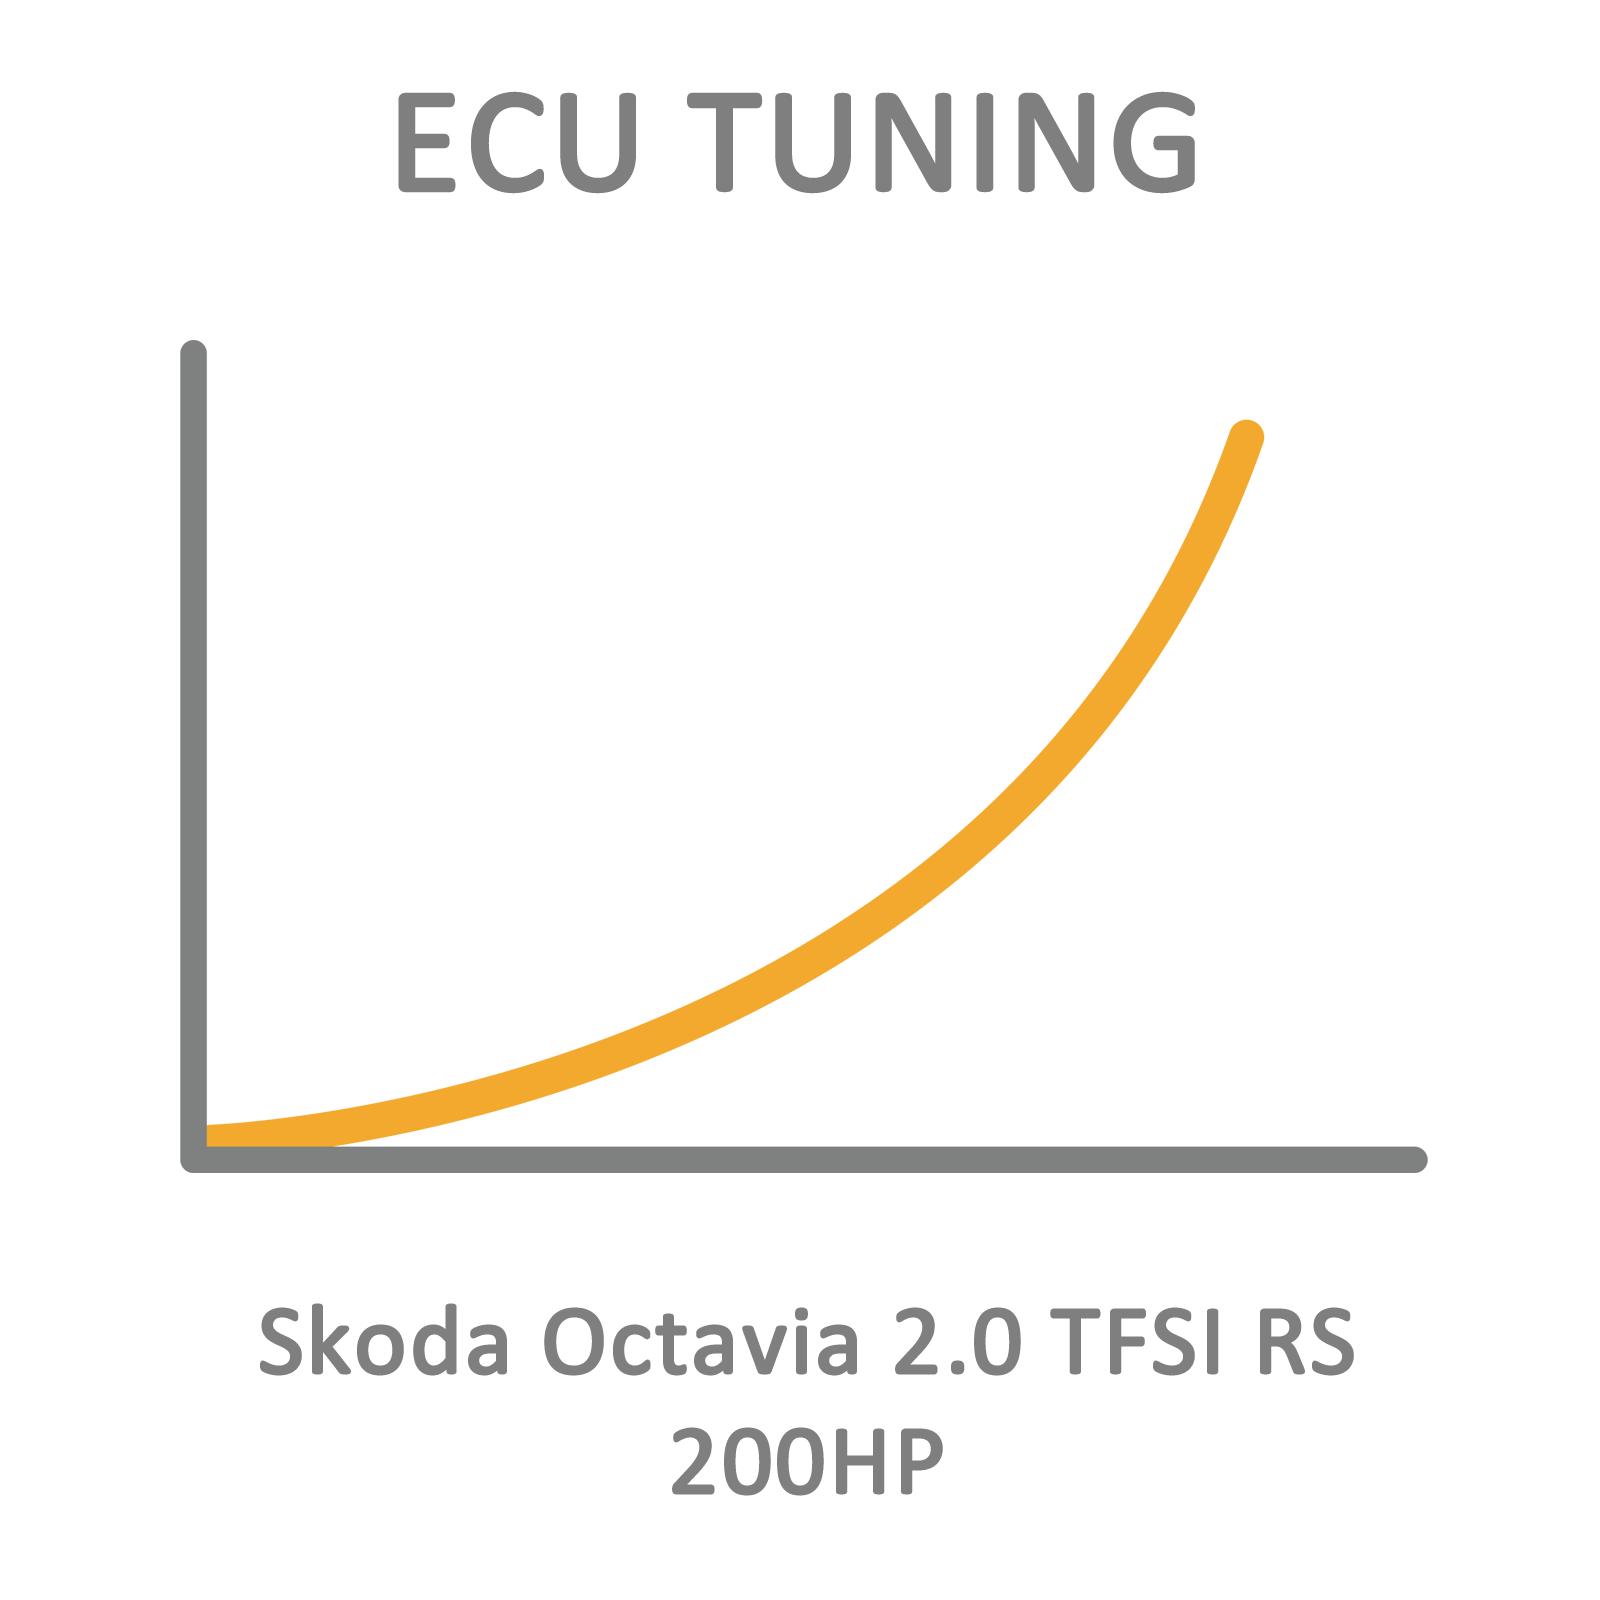 Skoda Octavia 2.0 TFSI RS 200HP ECU Tuning Remapping